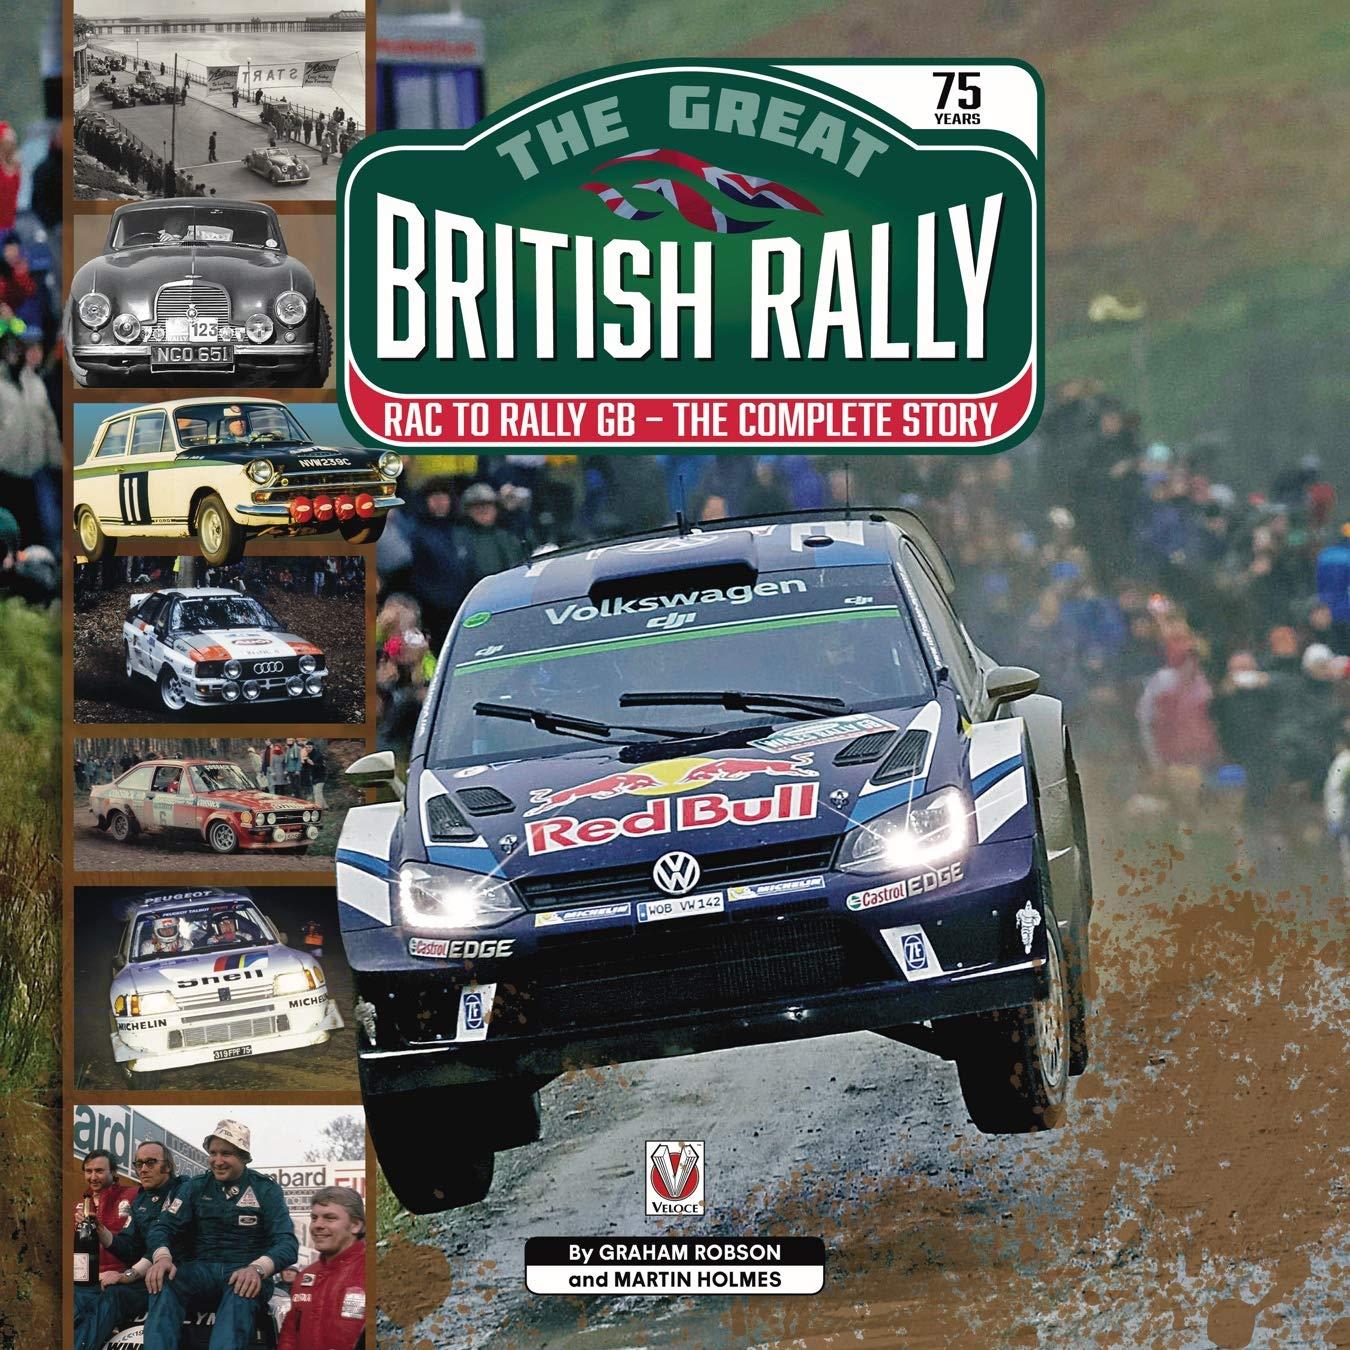 Robson, G: Great British Rally: Rac to Rally GB - The Complete Story: Amazon.es: Robson, Graham, Holmes, Martin: Libros en idiomas extranjeros